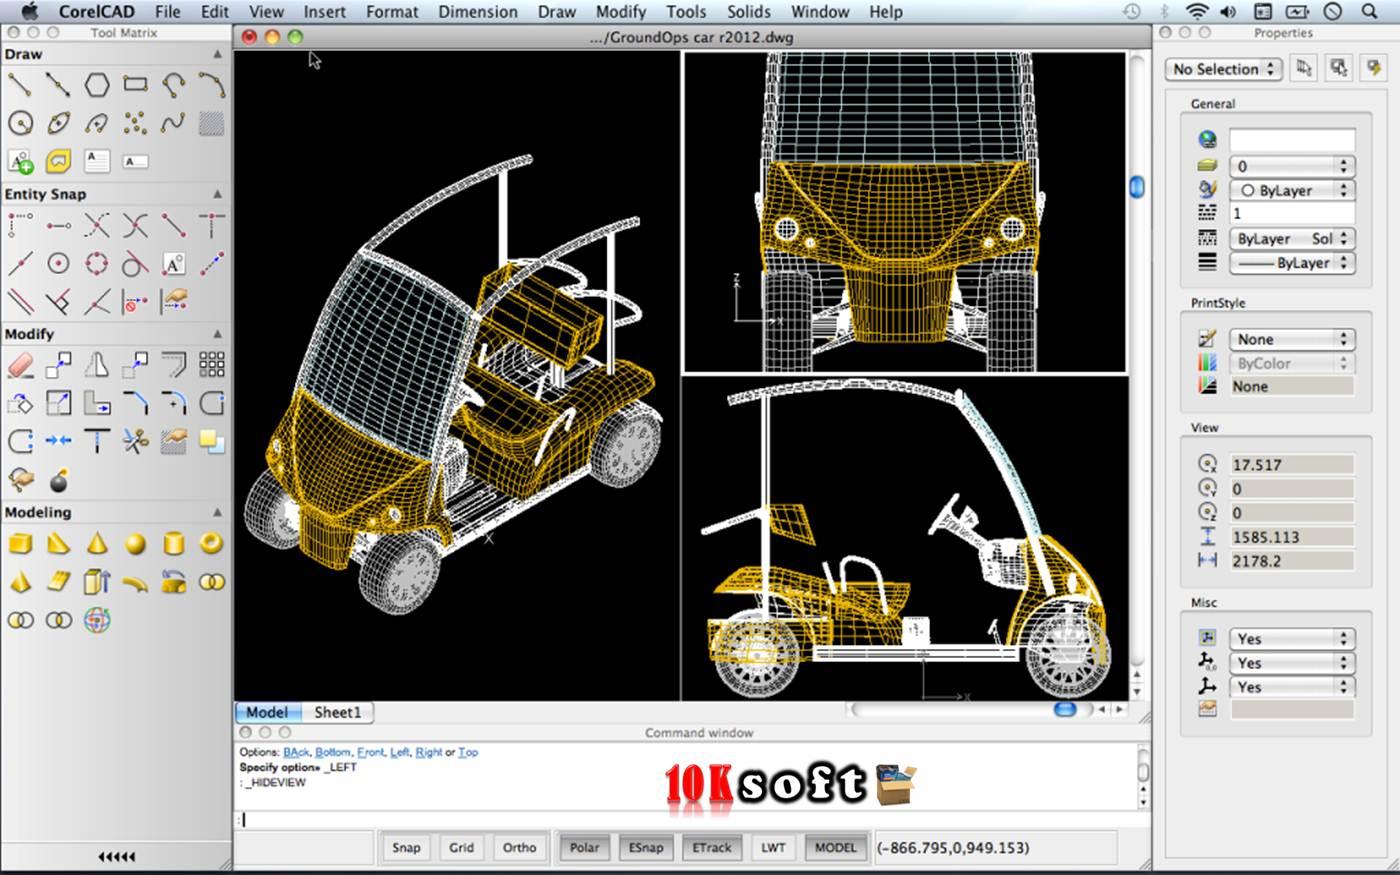 CorelCAD 2013 32 Bit Free Download